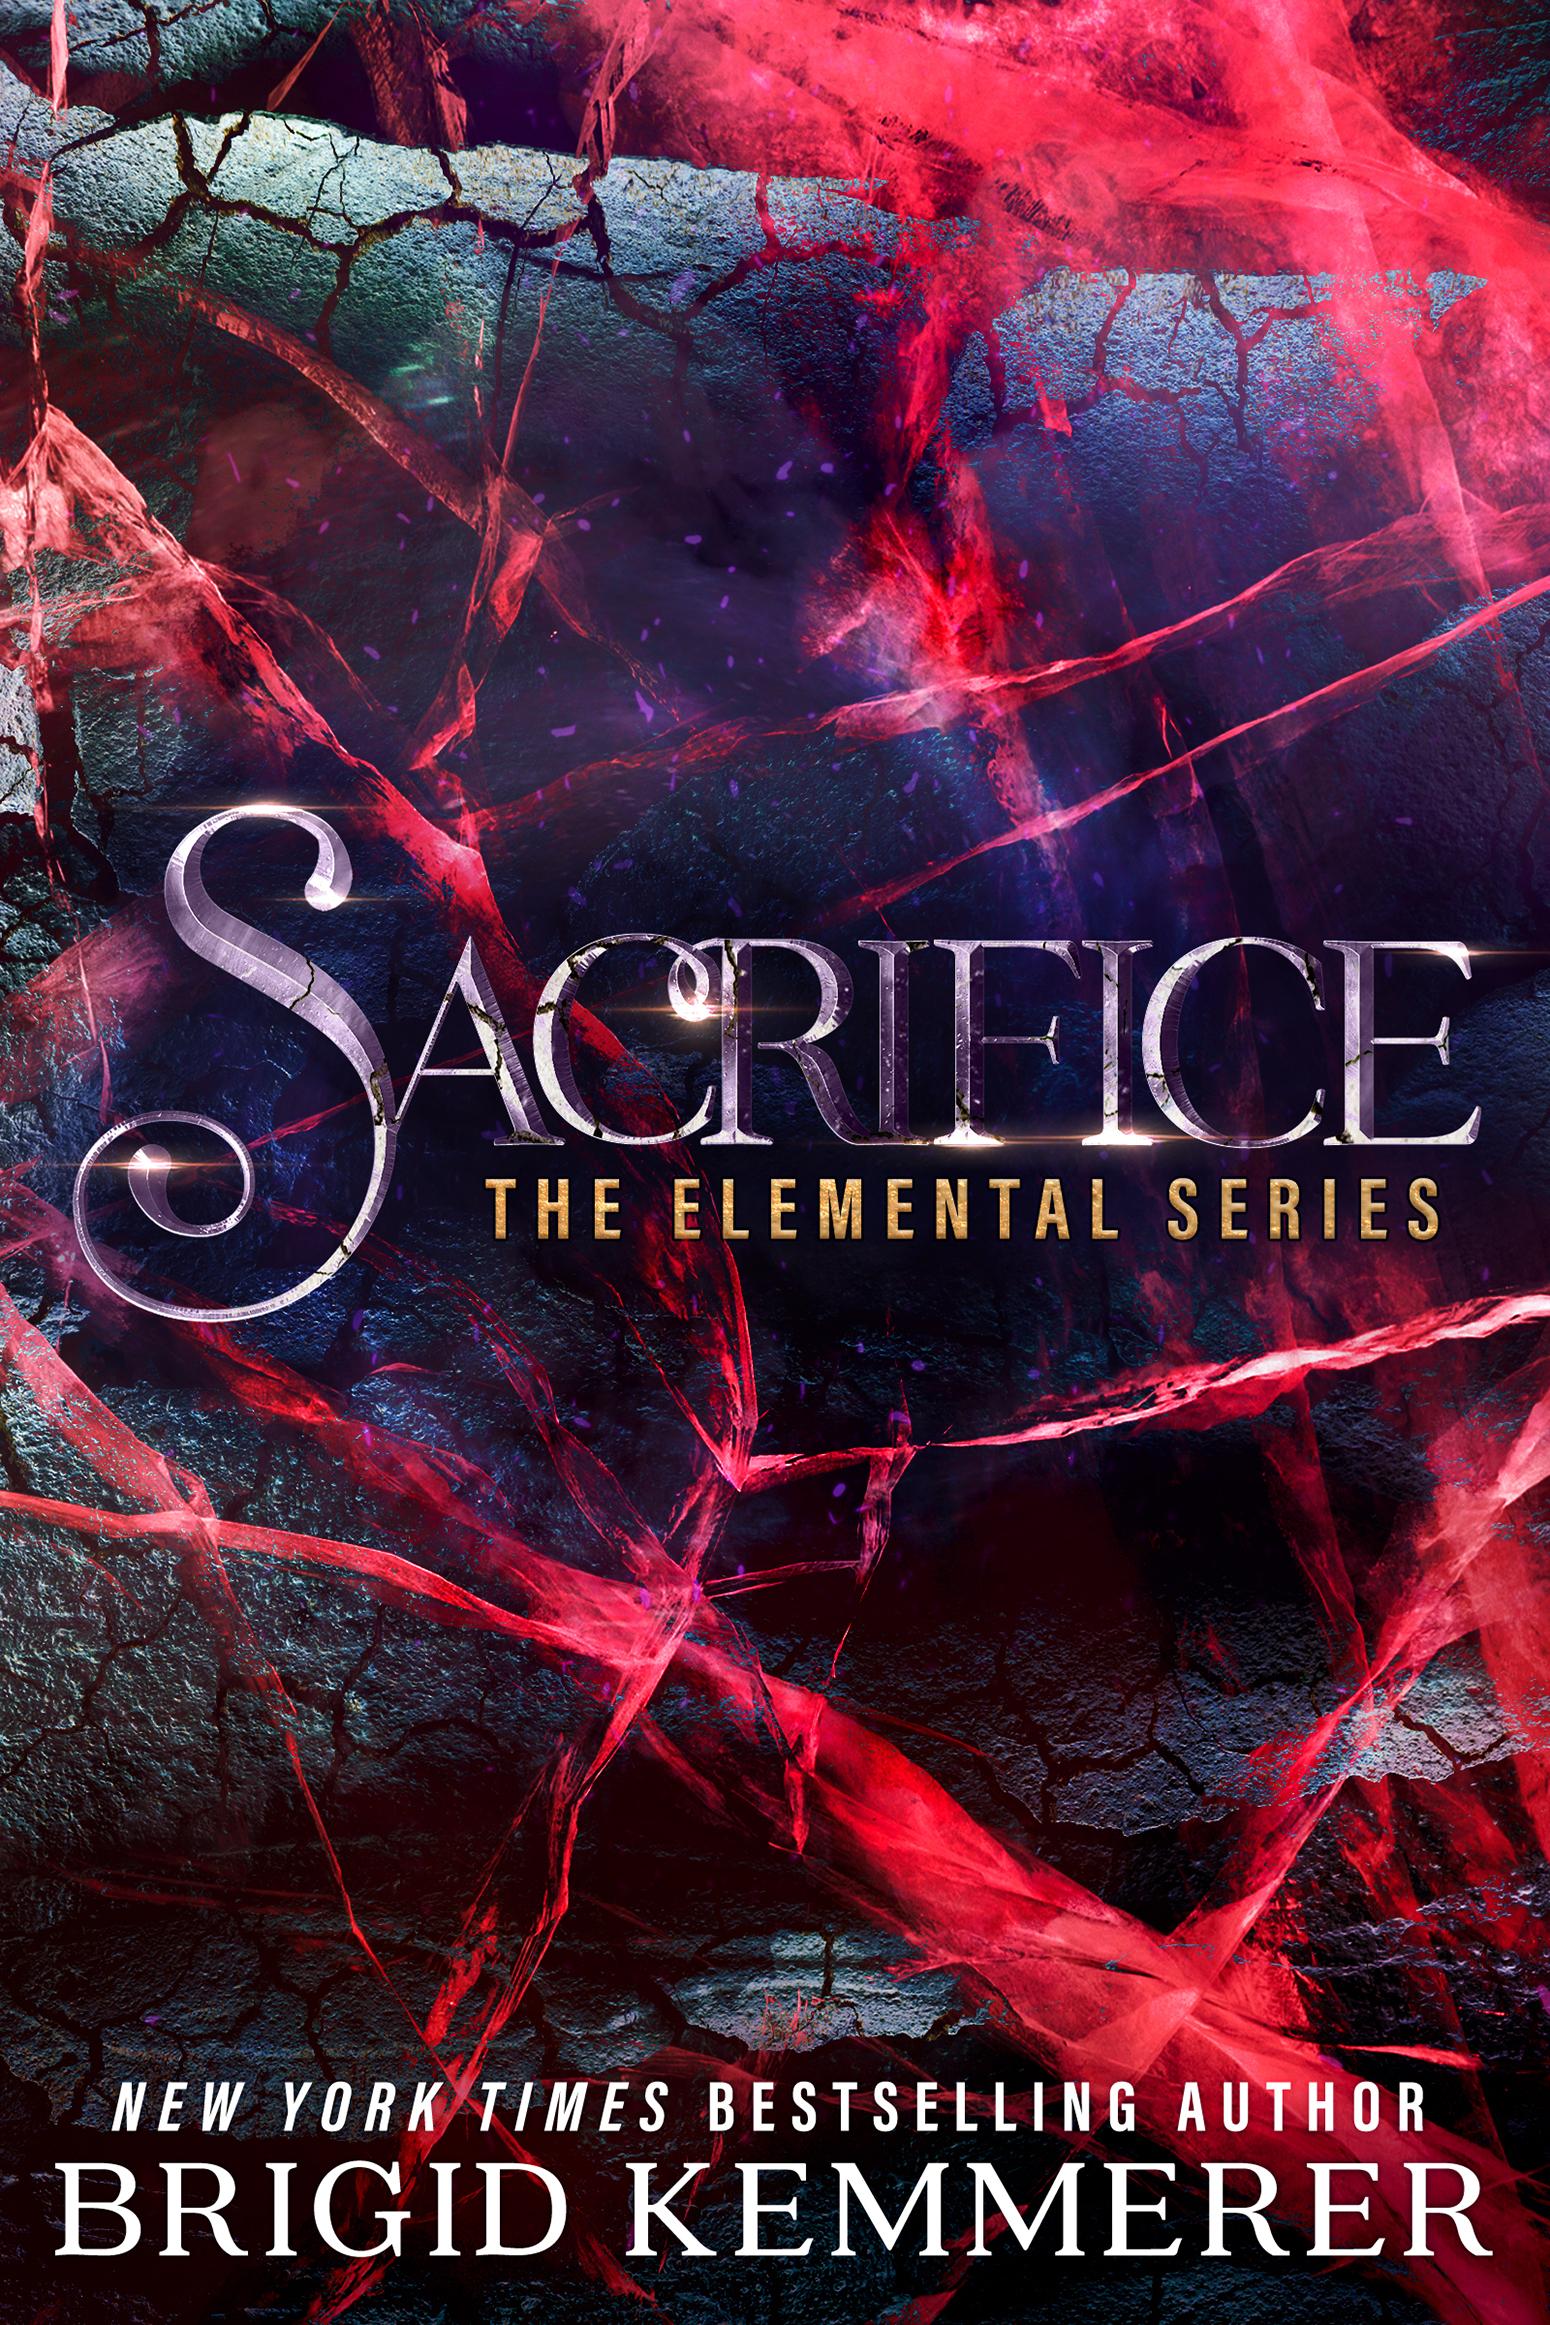 Cover Image of Sacrifice